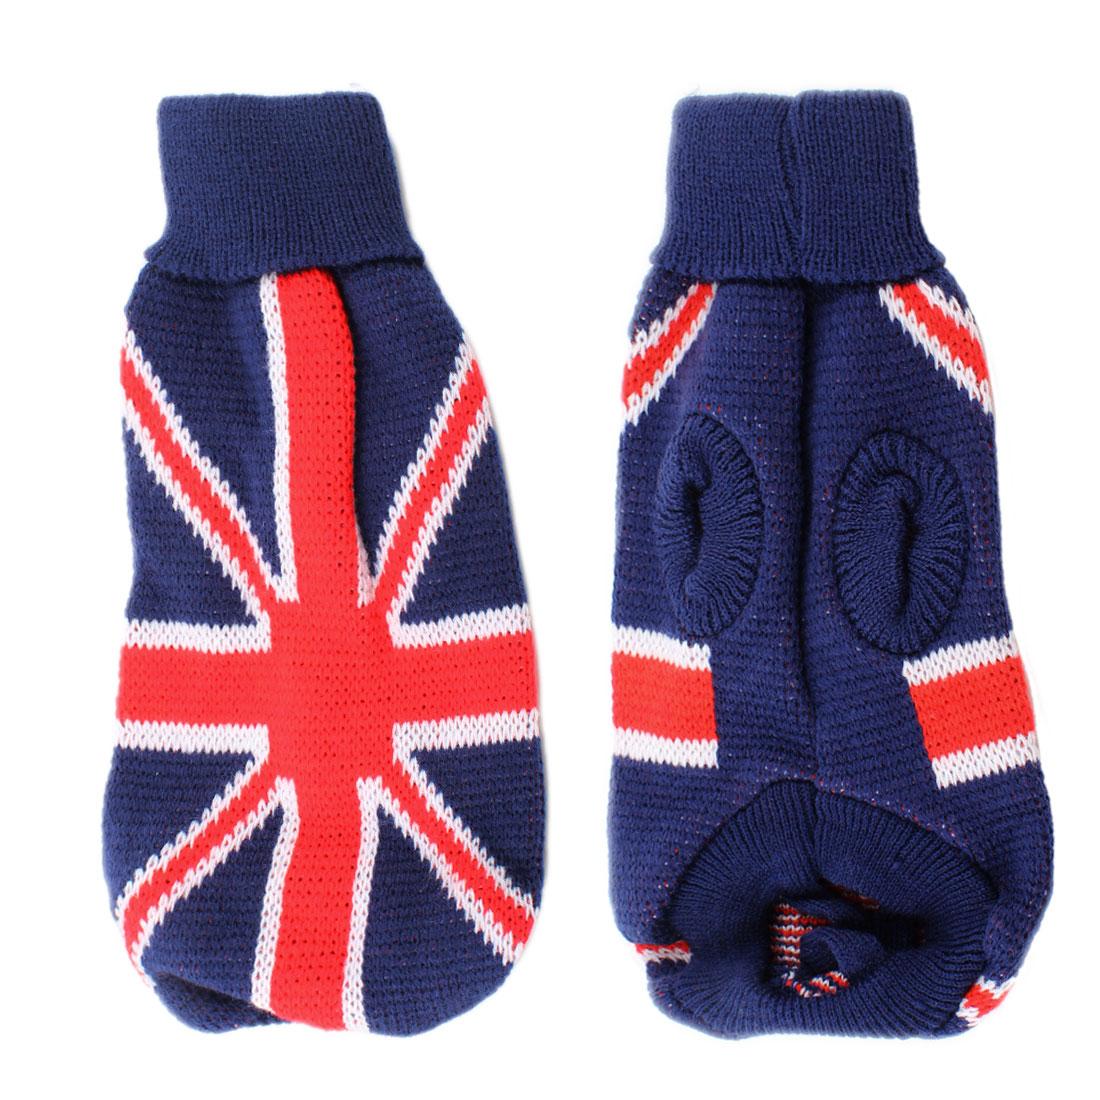 Warm UK Flag Print Turtleneck Pet Dog Knitwear Knitted Apparel Sweater Blue XXS